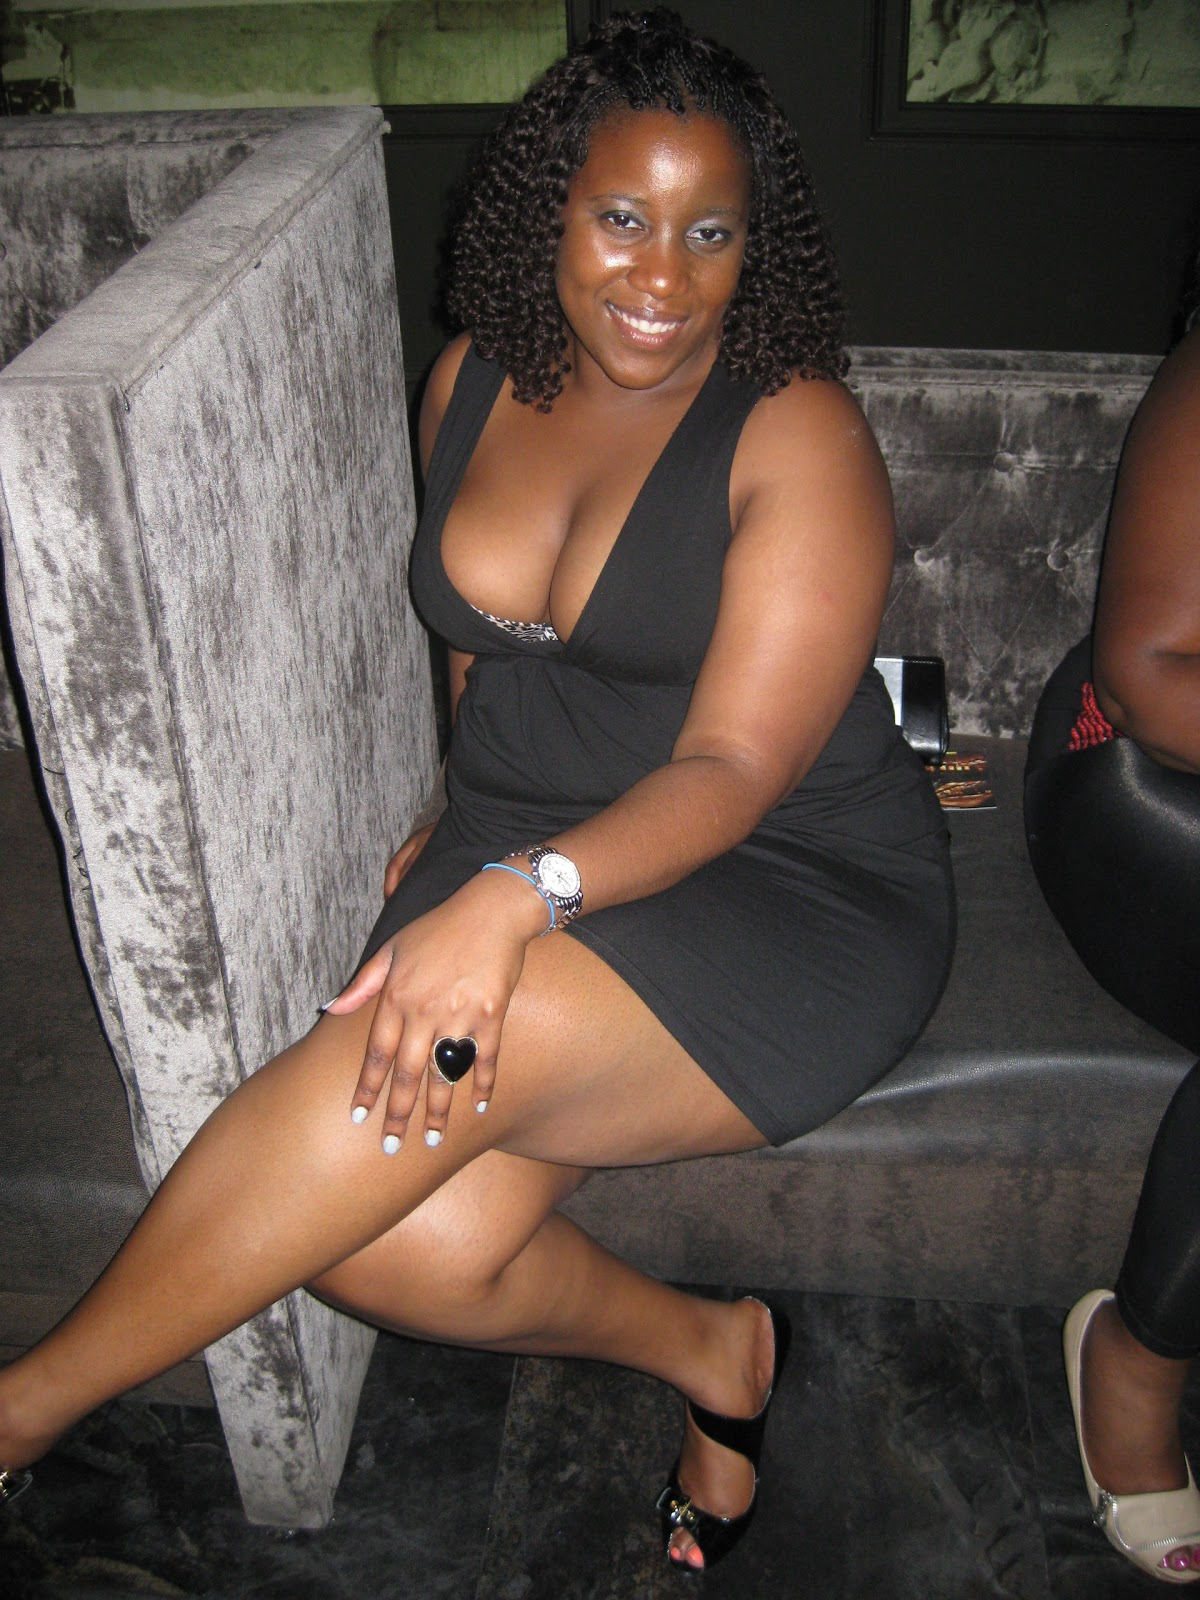 BLACK WOMAN NUDE PUSSY PICS